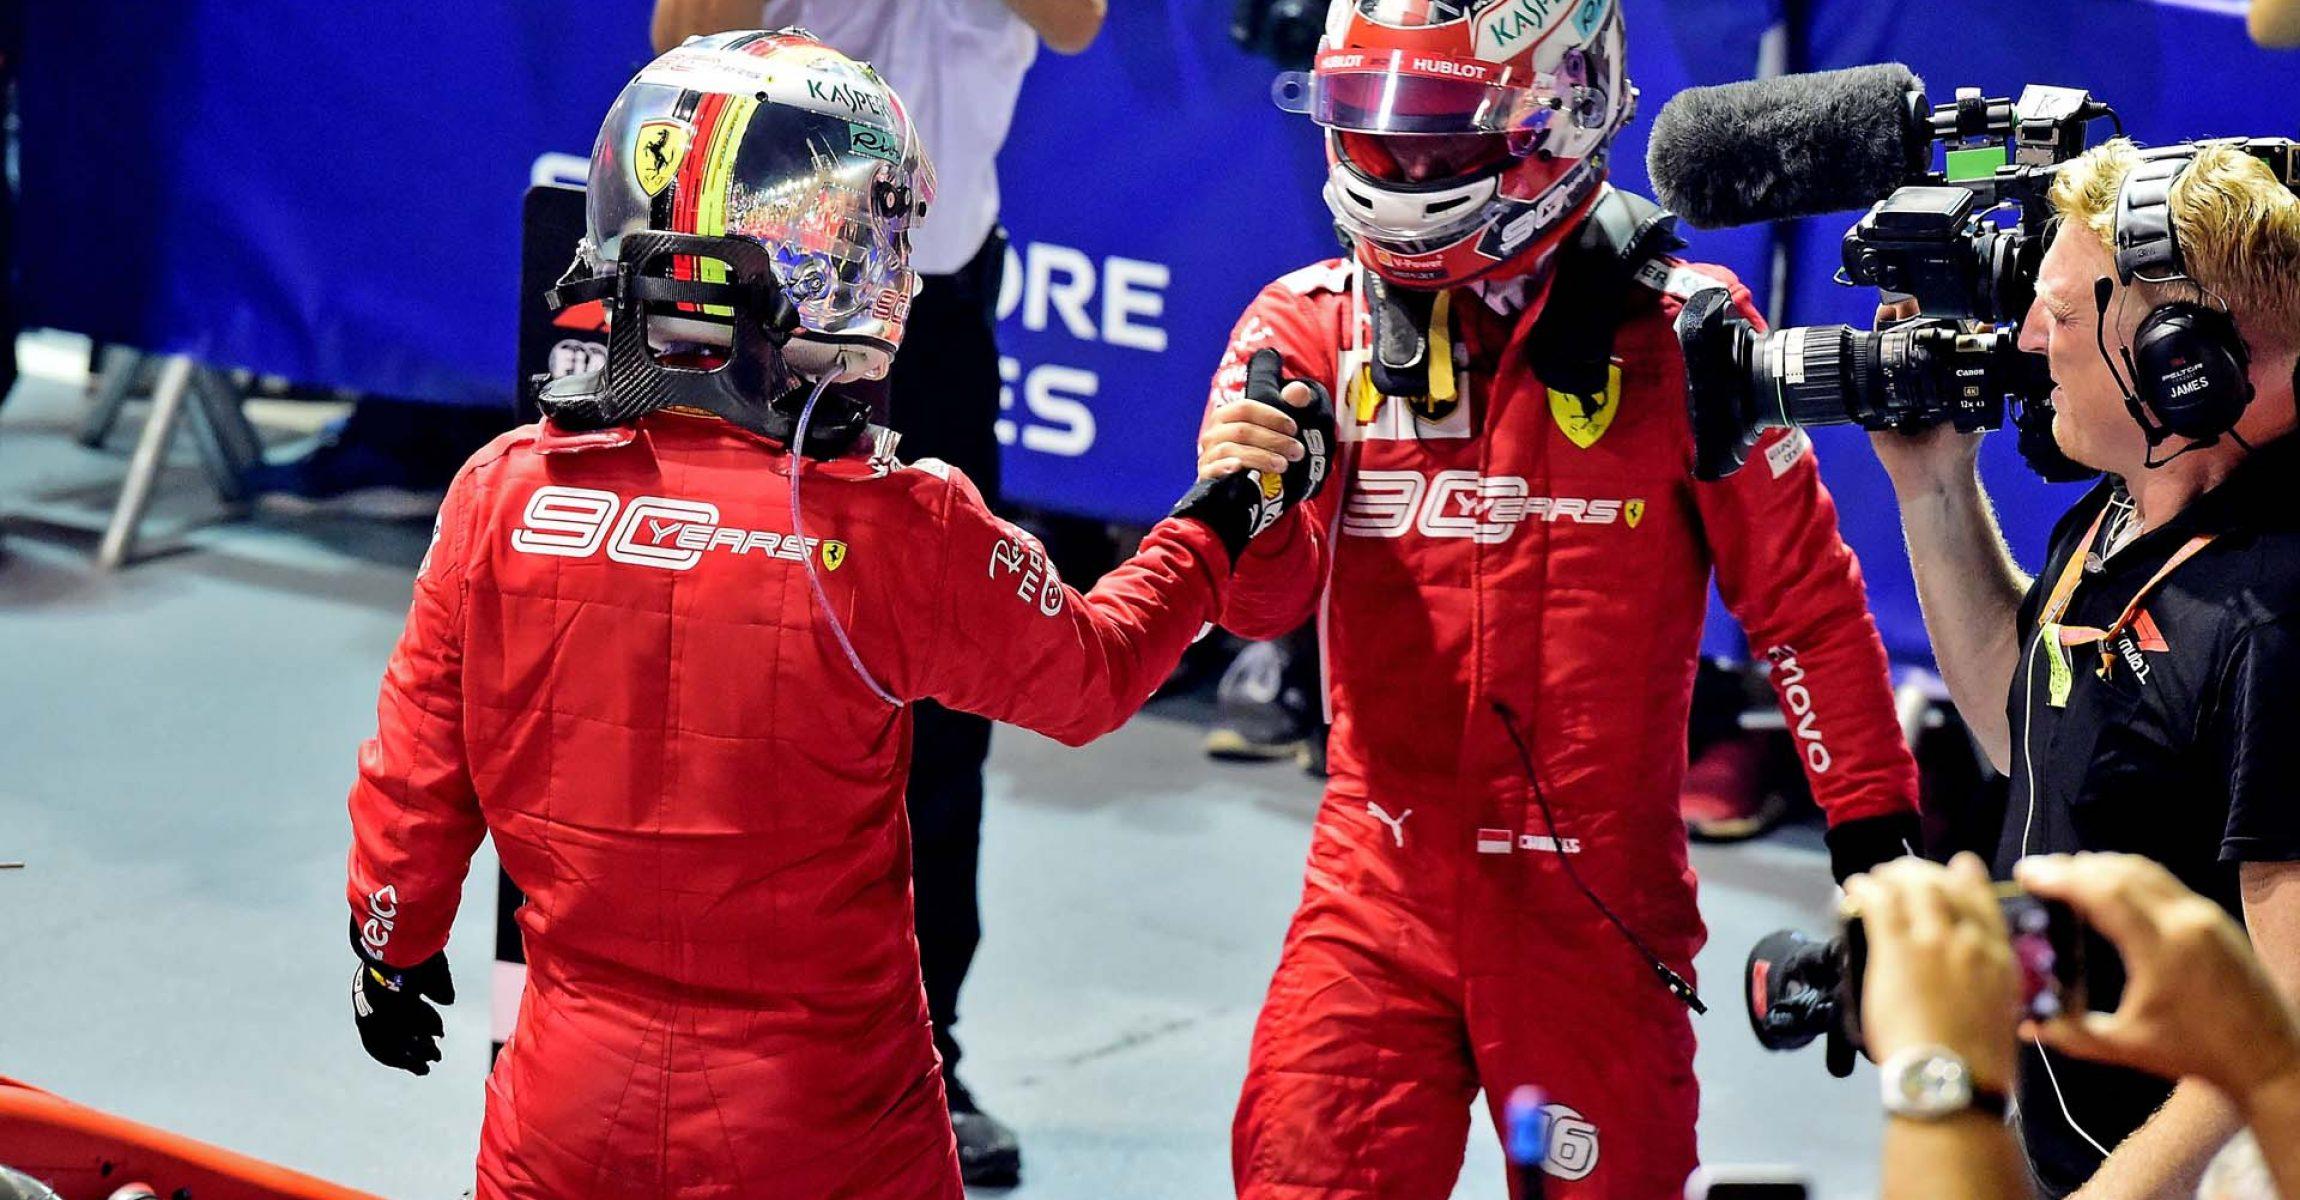 GP SINGAPORE F1/2019 -  DOMENICA 22/09/2019   credit: @Scuderia Ferrari Press Office Sebastian Vettel Charles Leclerc